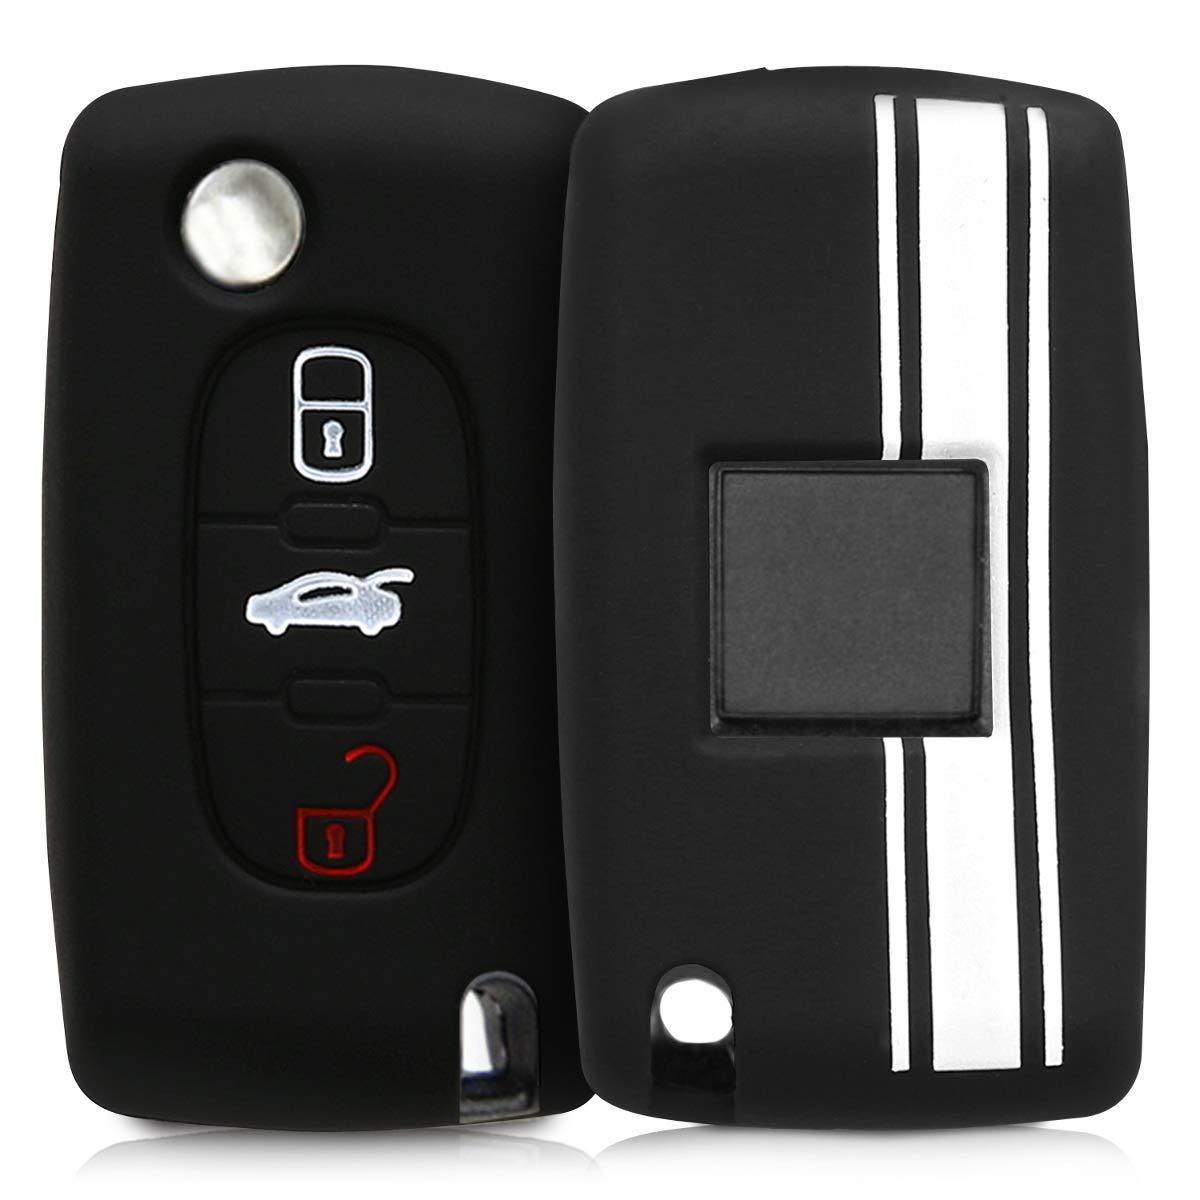 Fob Guard Car Key Signal Blocker Bag WIFI Car Key Signal Blocker Case GSM Blocker Case 2 Pack and 5 Pack RFID Blocking Secure Card Holder Nabance Signal Blocking Case Antitheft Lock Devices RFID Blocker LTE NFC